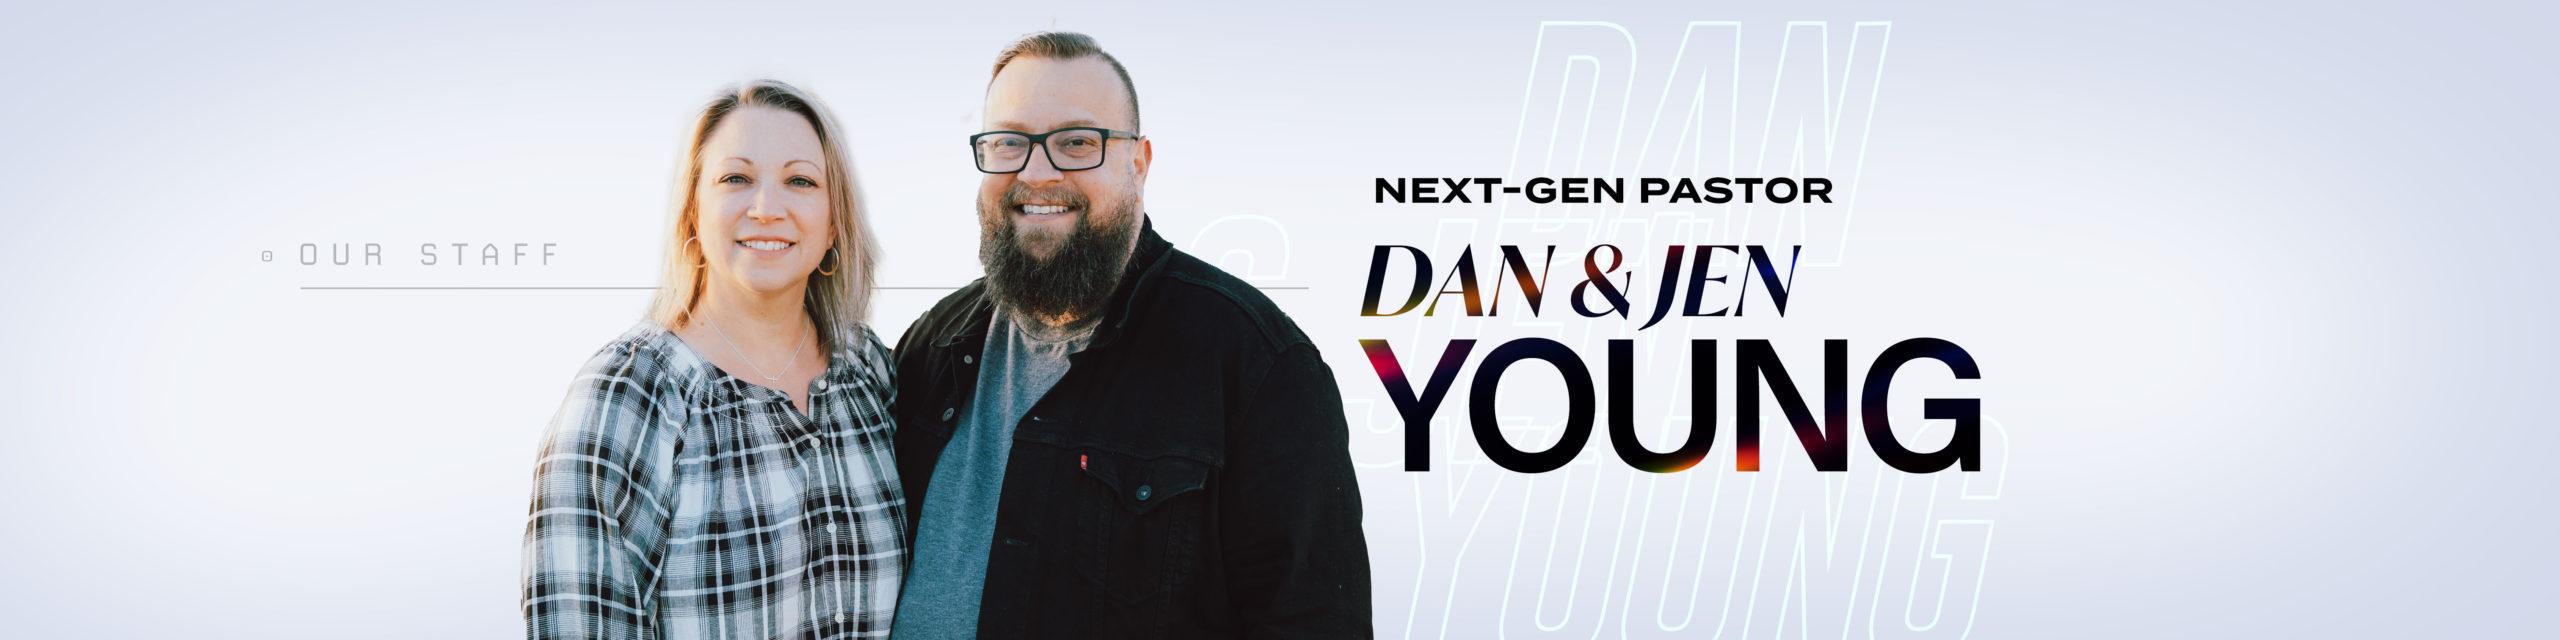 Dan and Jen Young - Next Gen Pastors of Nations Church Orlando